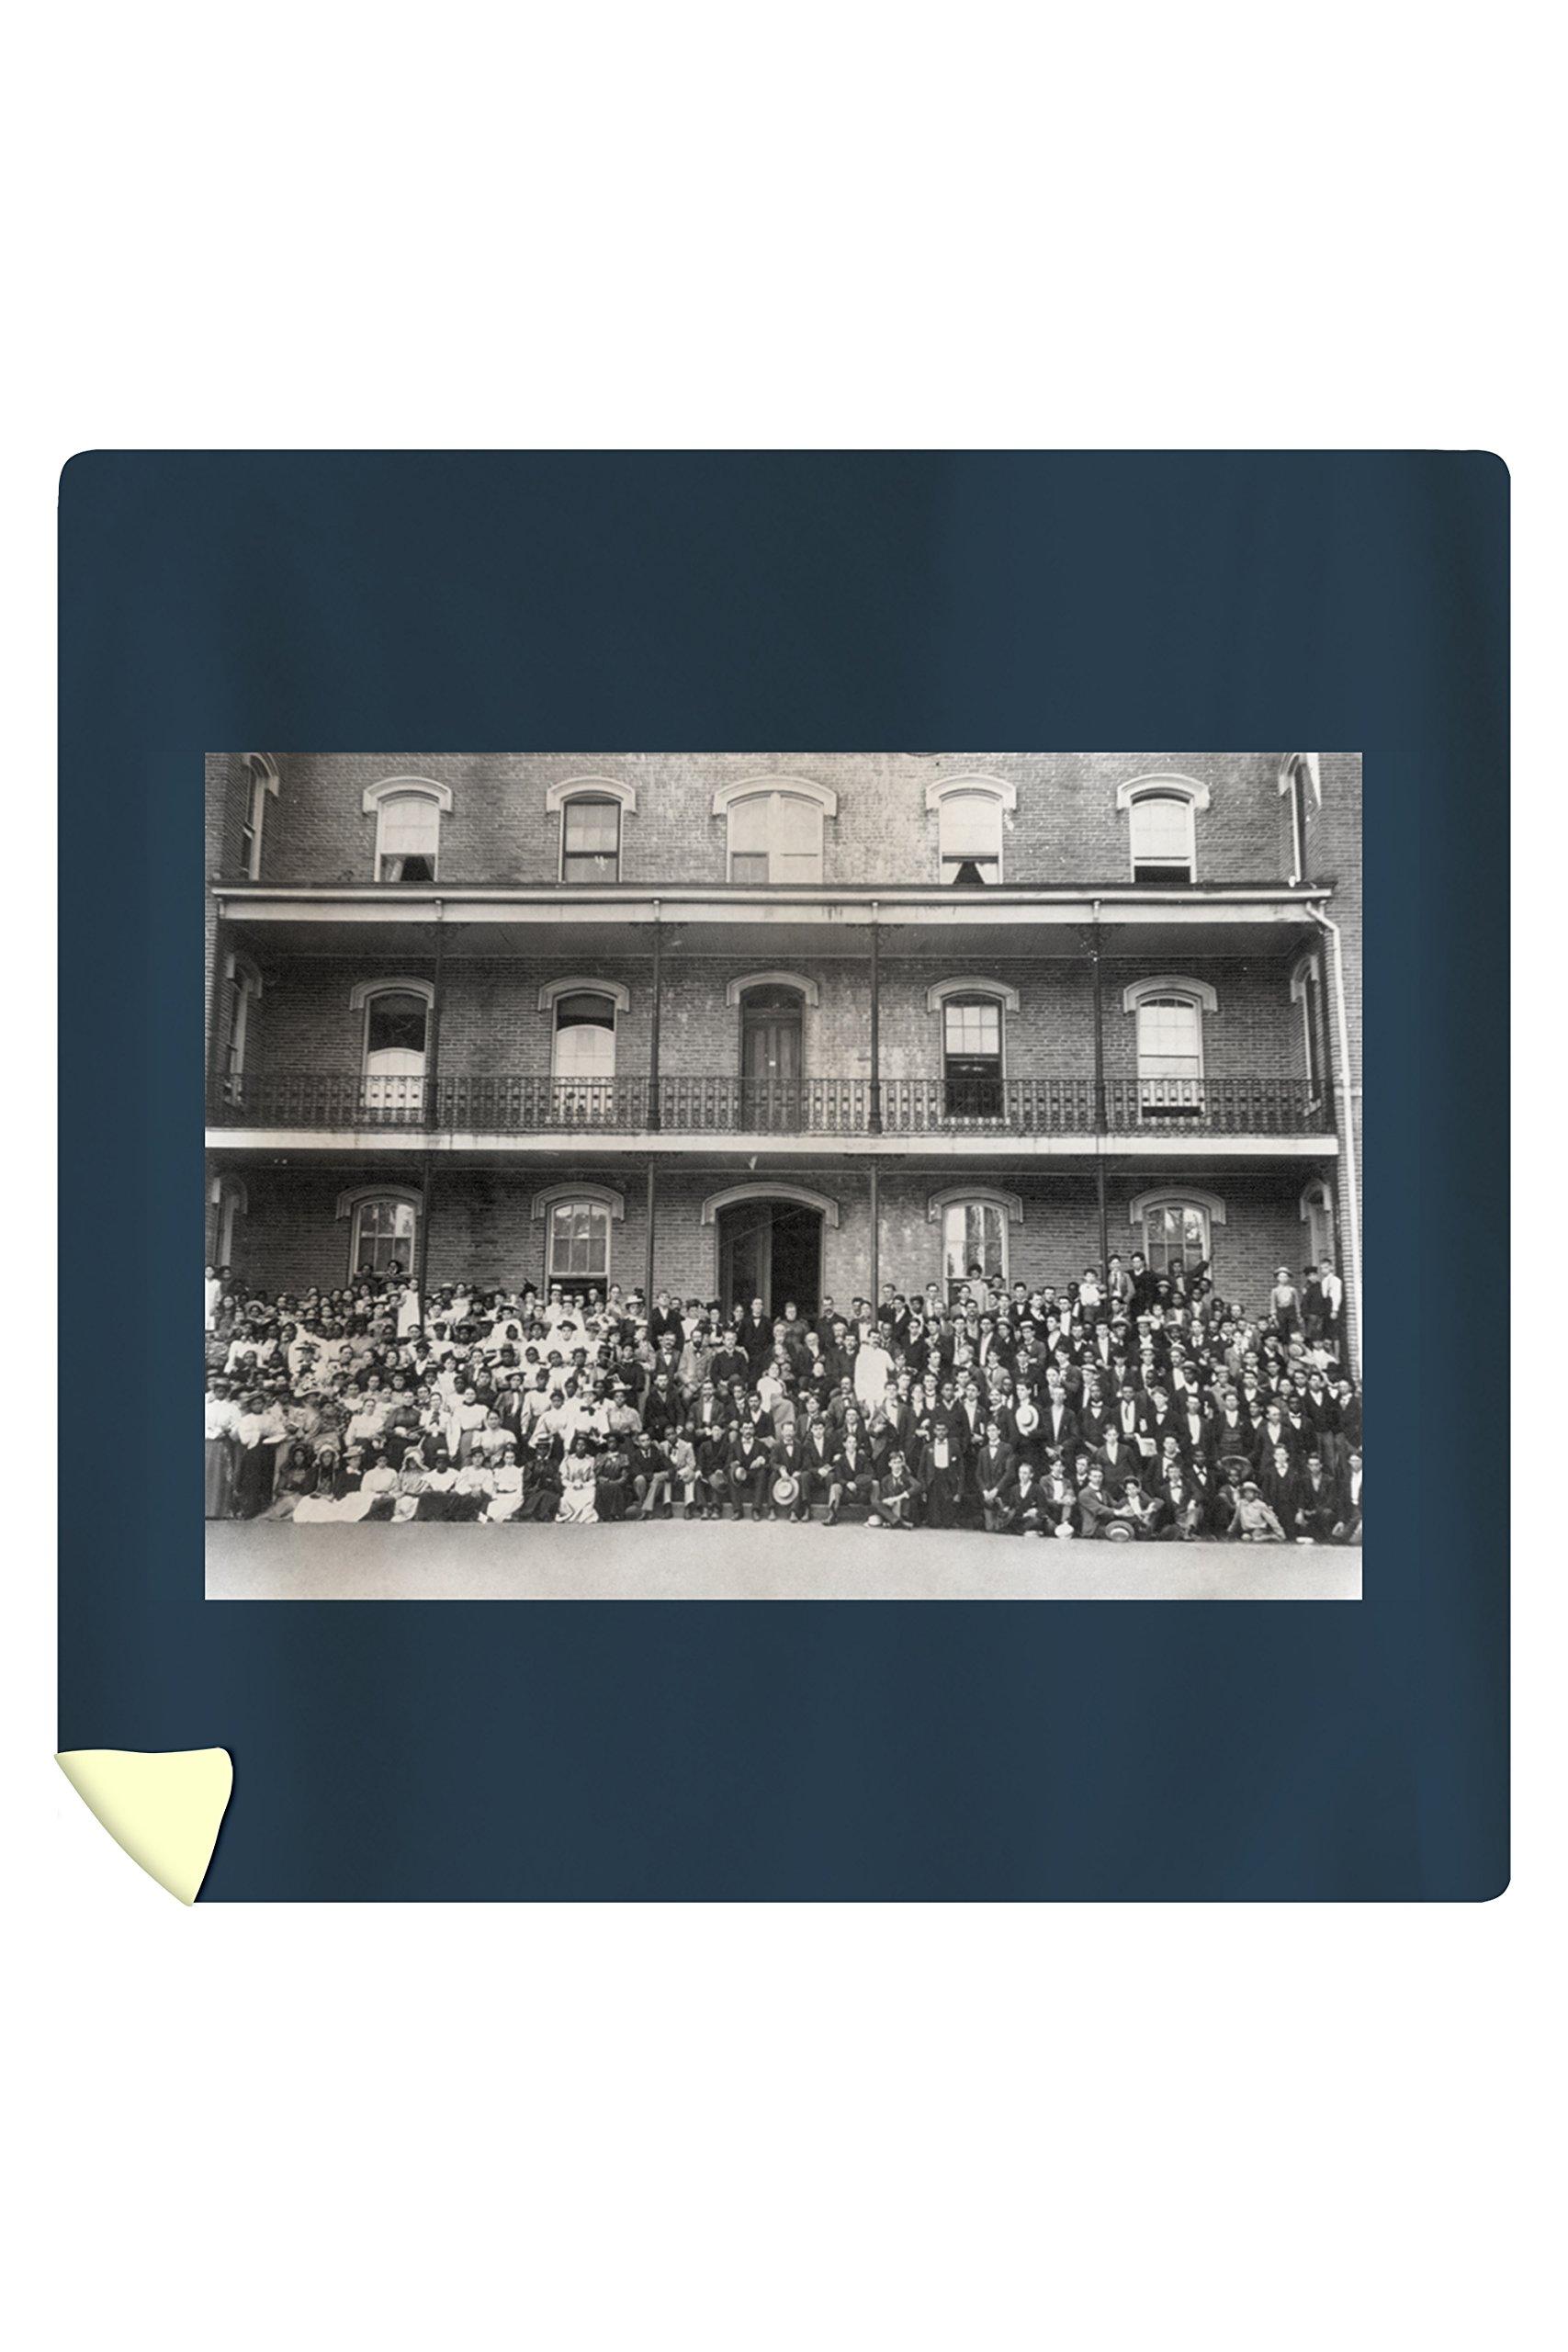 Student Body at Berea College Photograph (88x88 Queen Microfiber Duvet Cover)